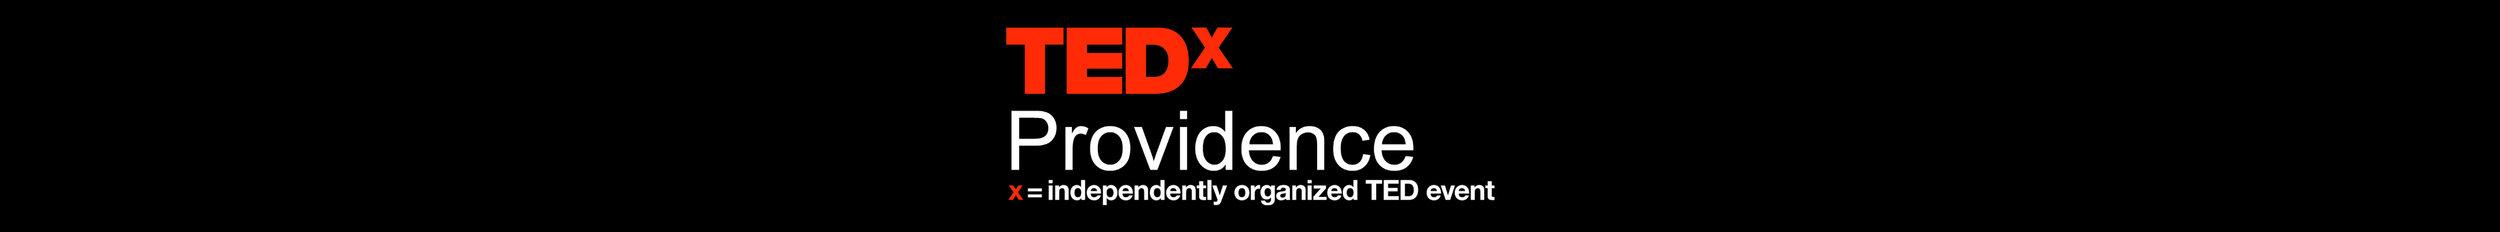 TEDx image 4.jpg